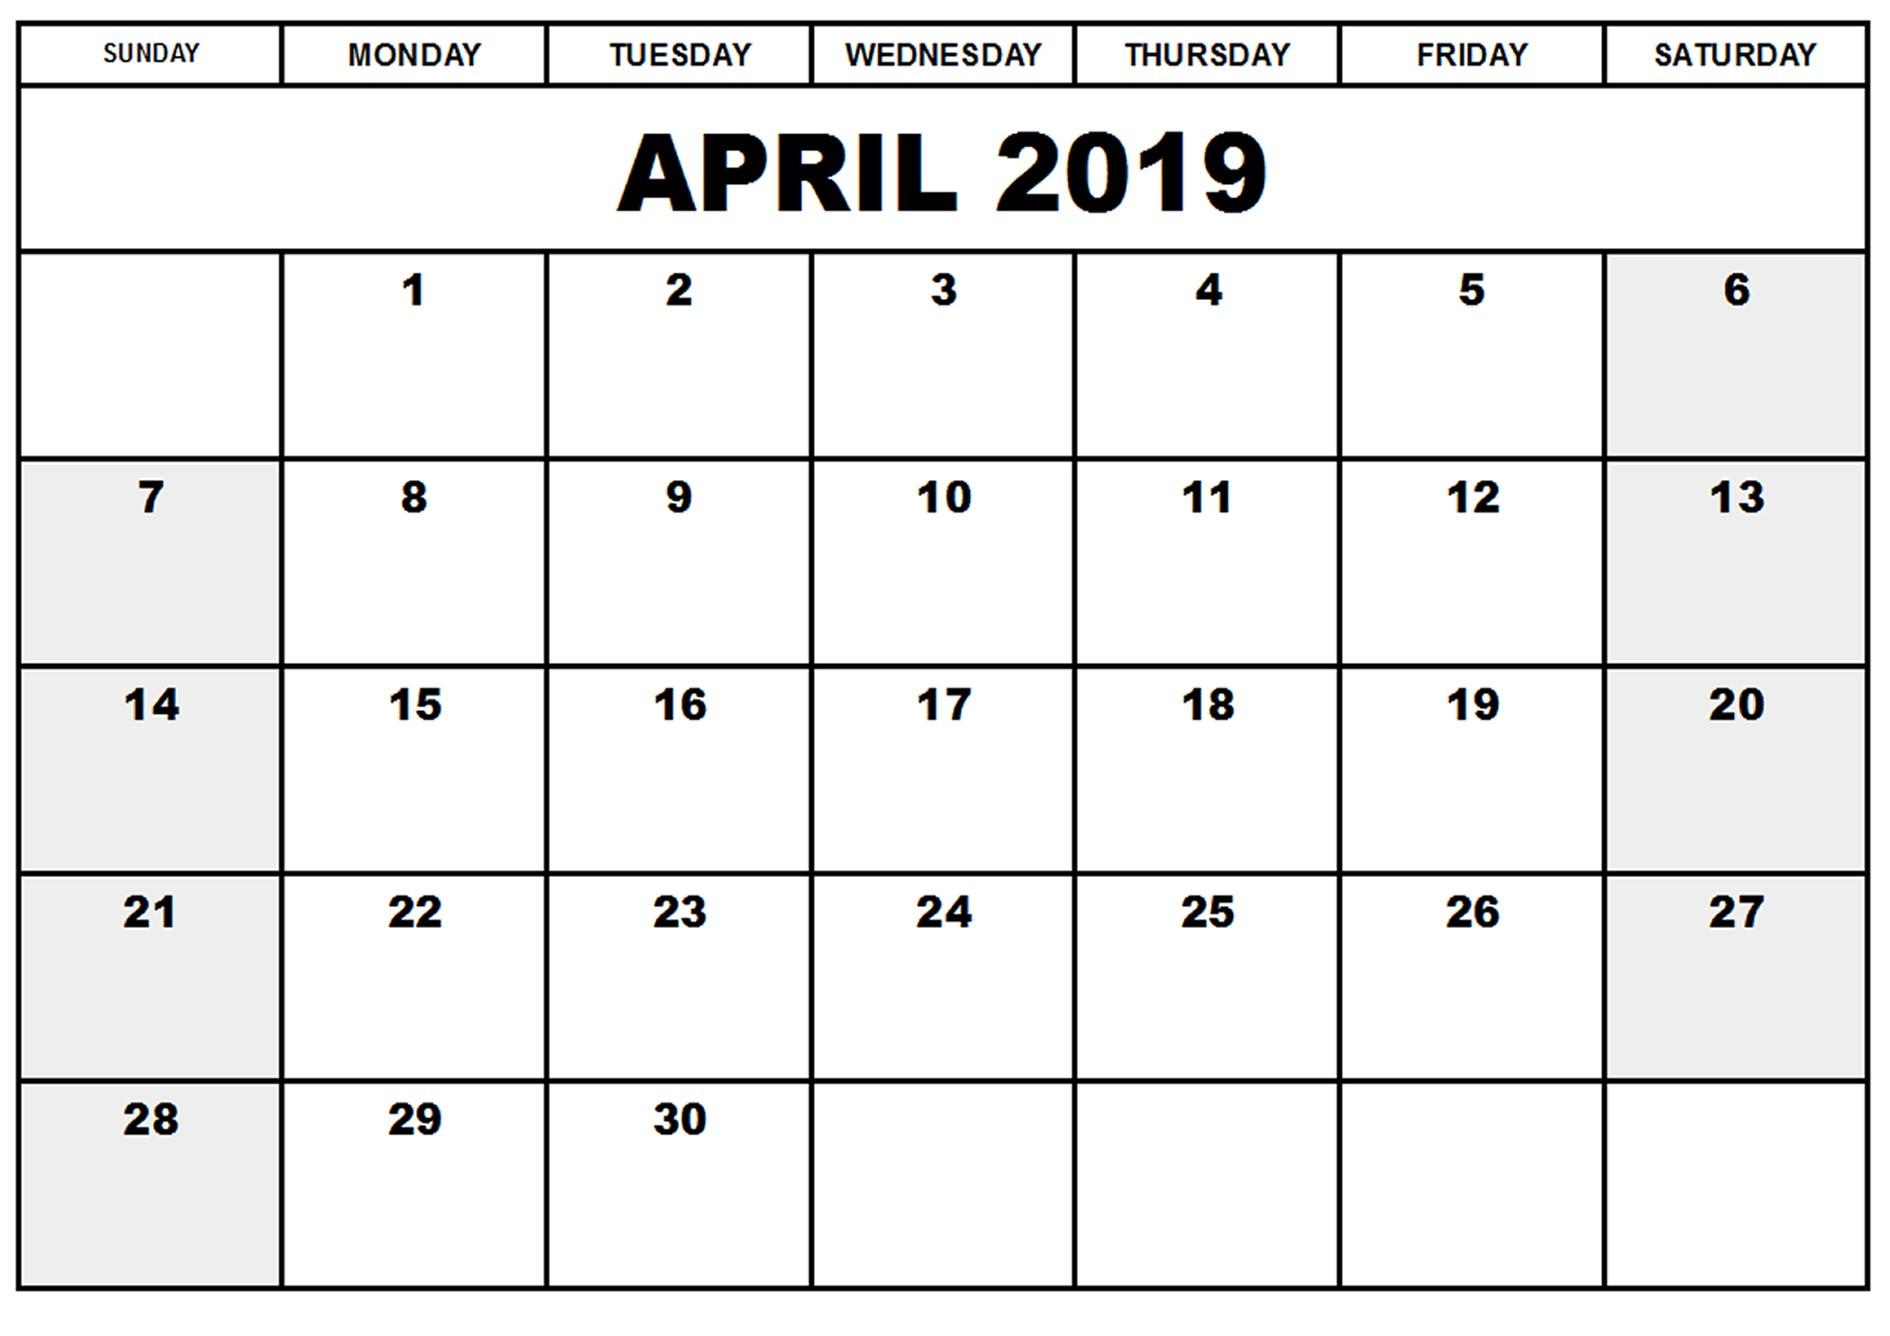 April 2019 Calendar Printable Blank Template